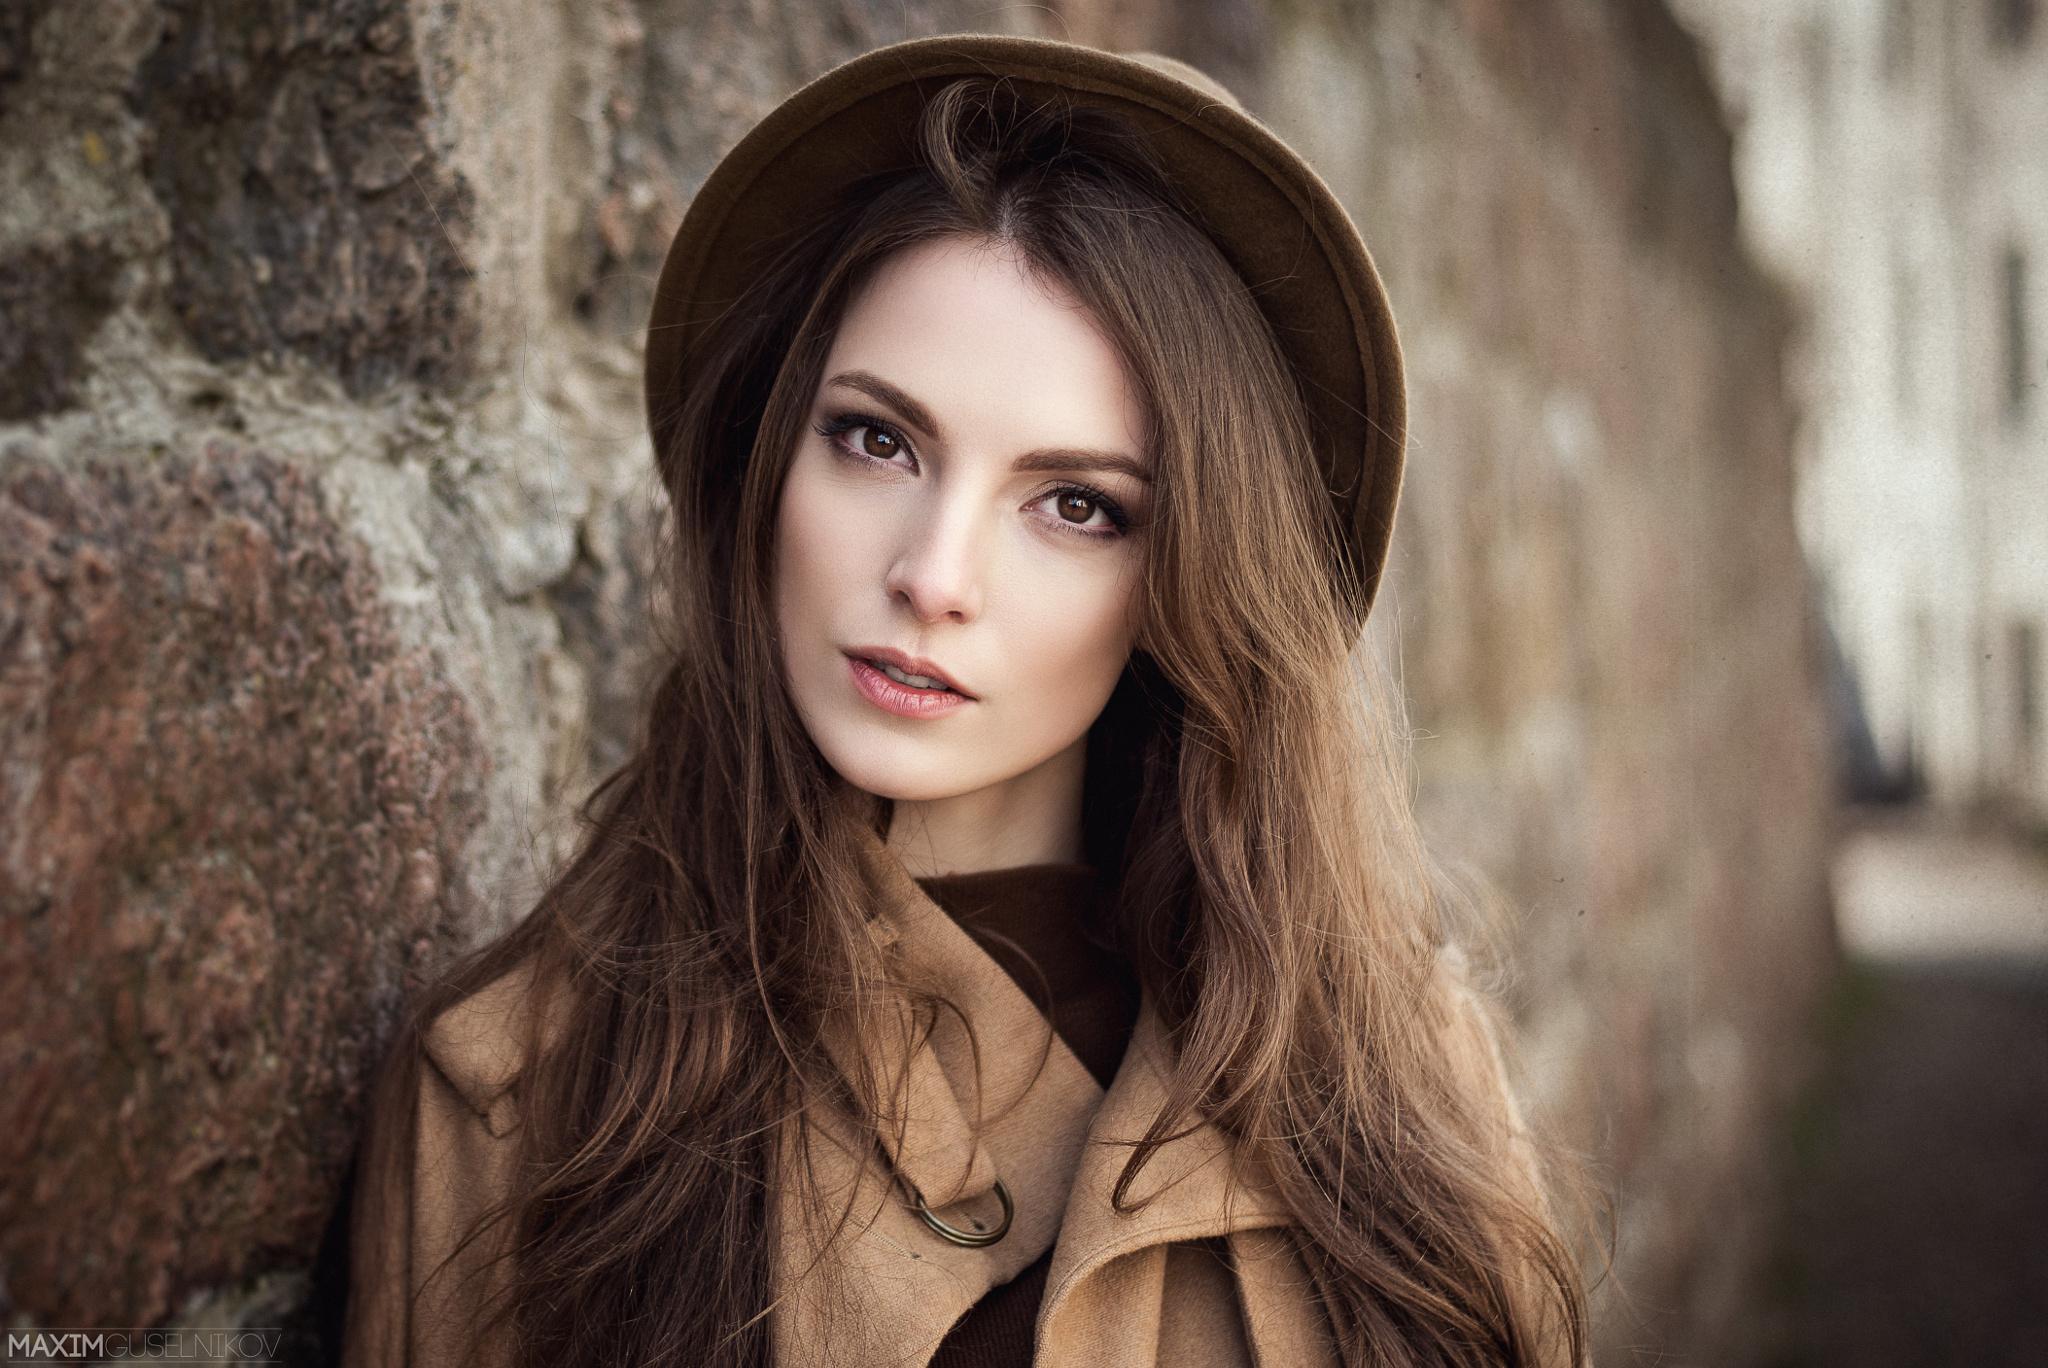 natural beauty girl wallpapers: Karina Suntseva HD Wallpaper